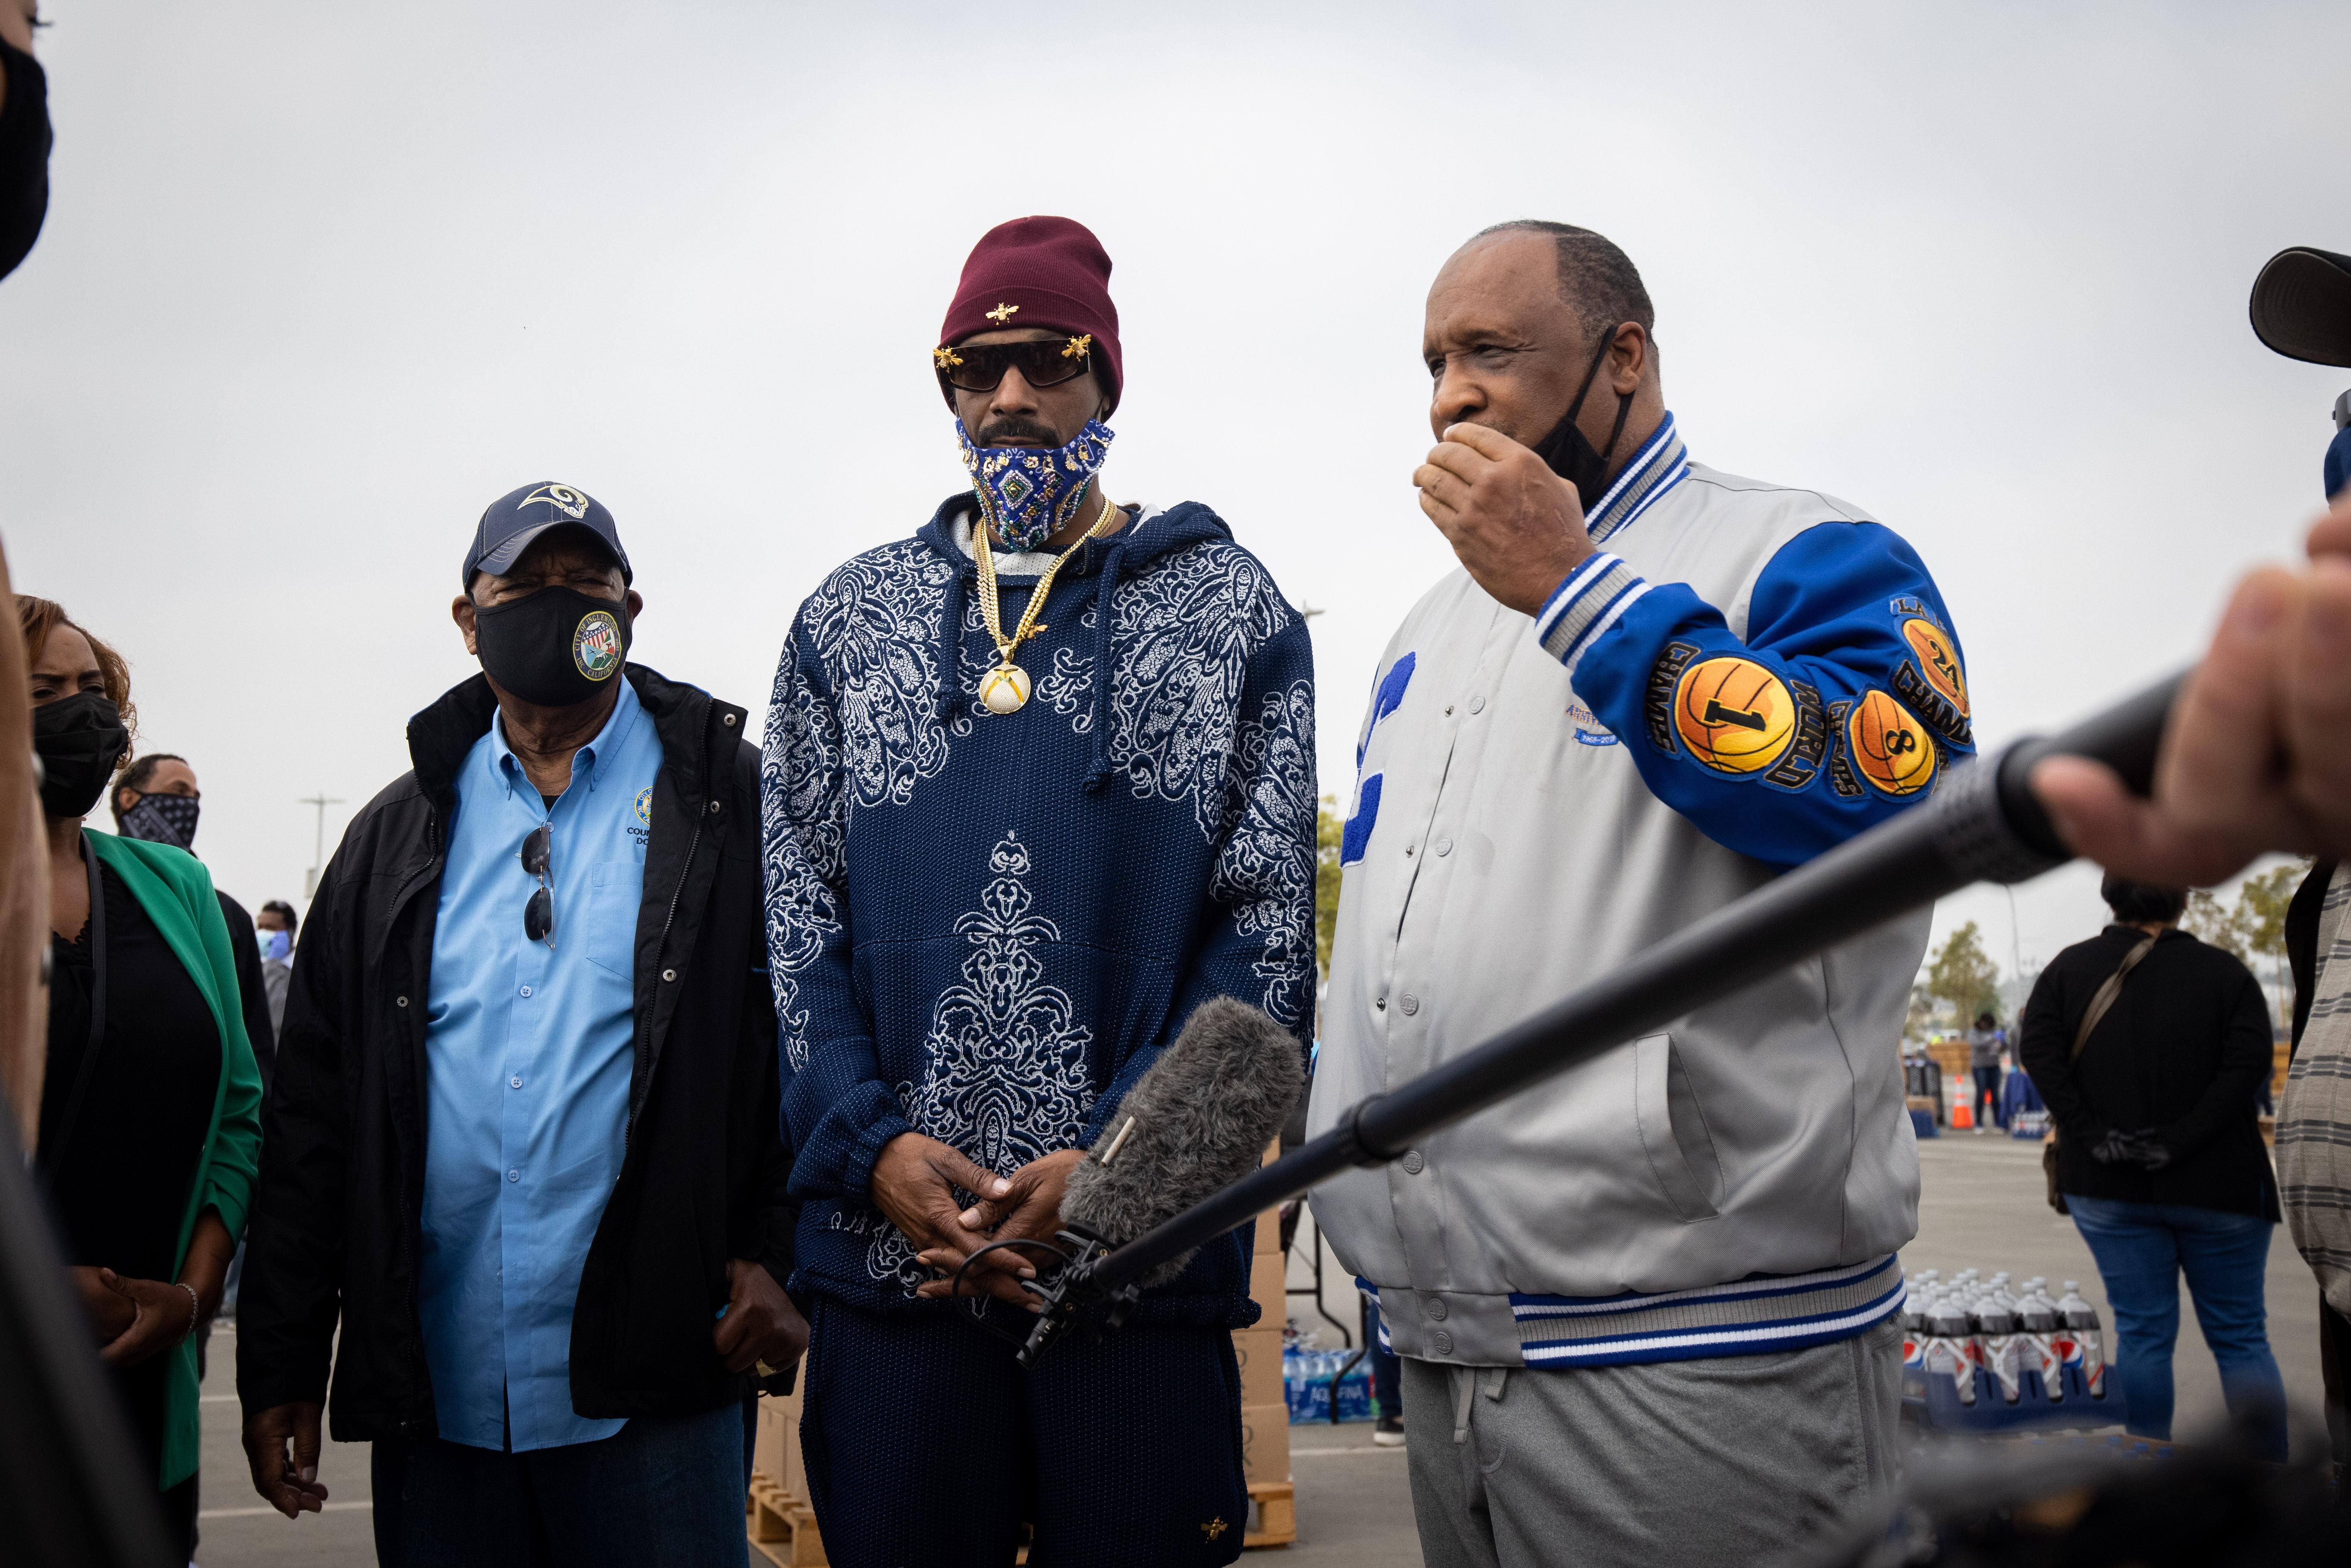 Snoop Dogg attends Drive-thru Turkey Distribution